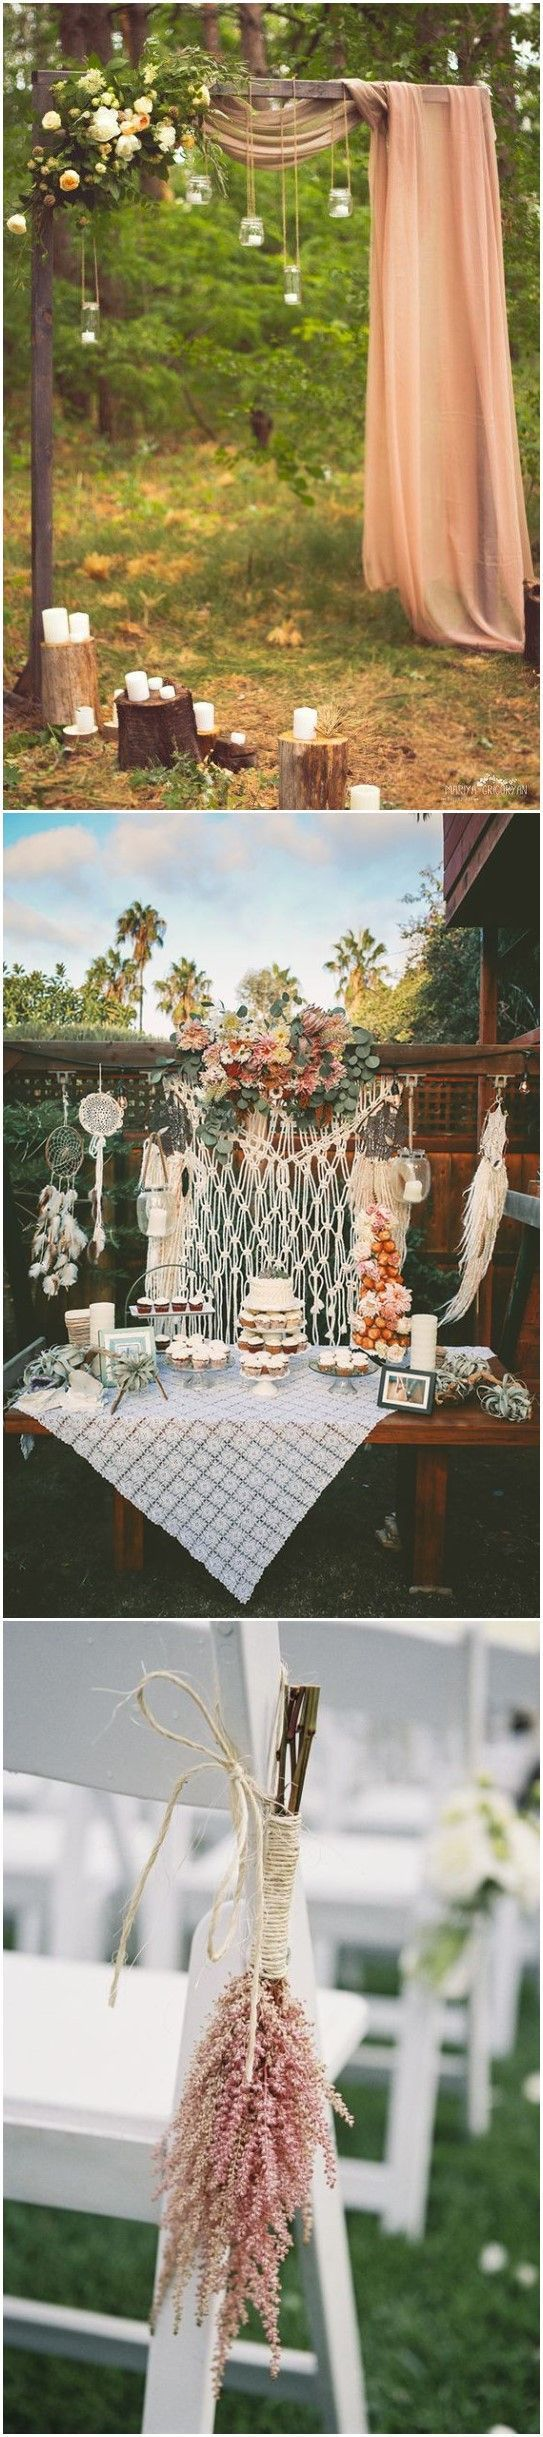 Best 25+ Cheap Wedding Decorations Ideas On Pinterest